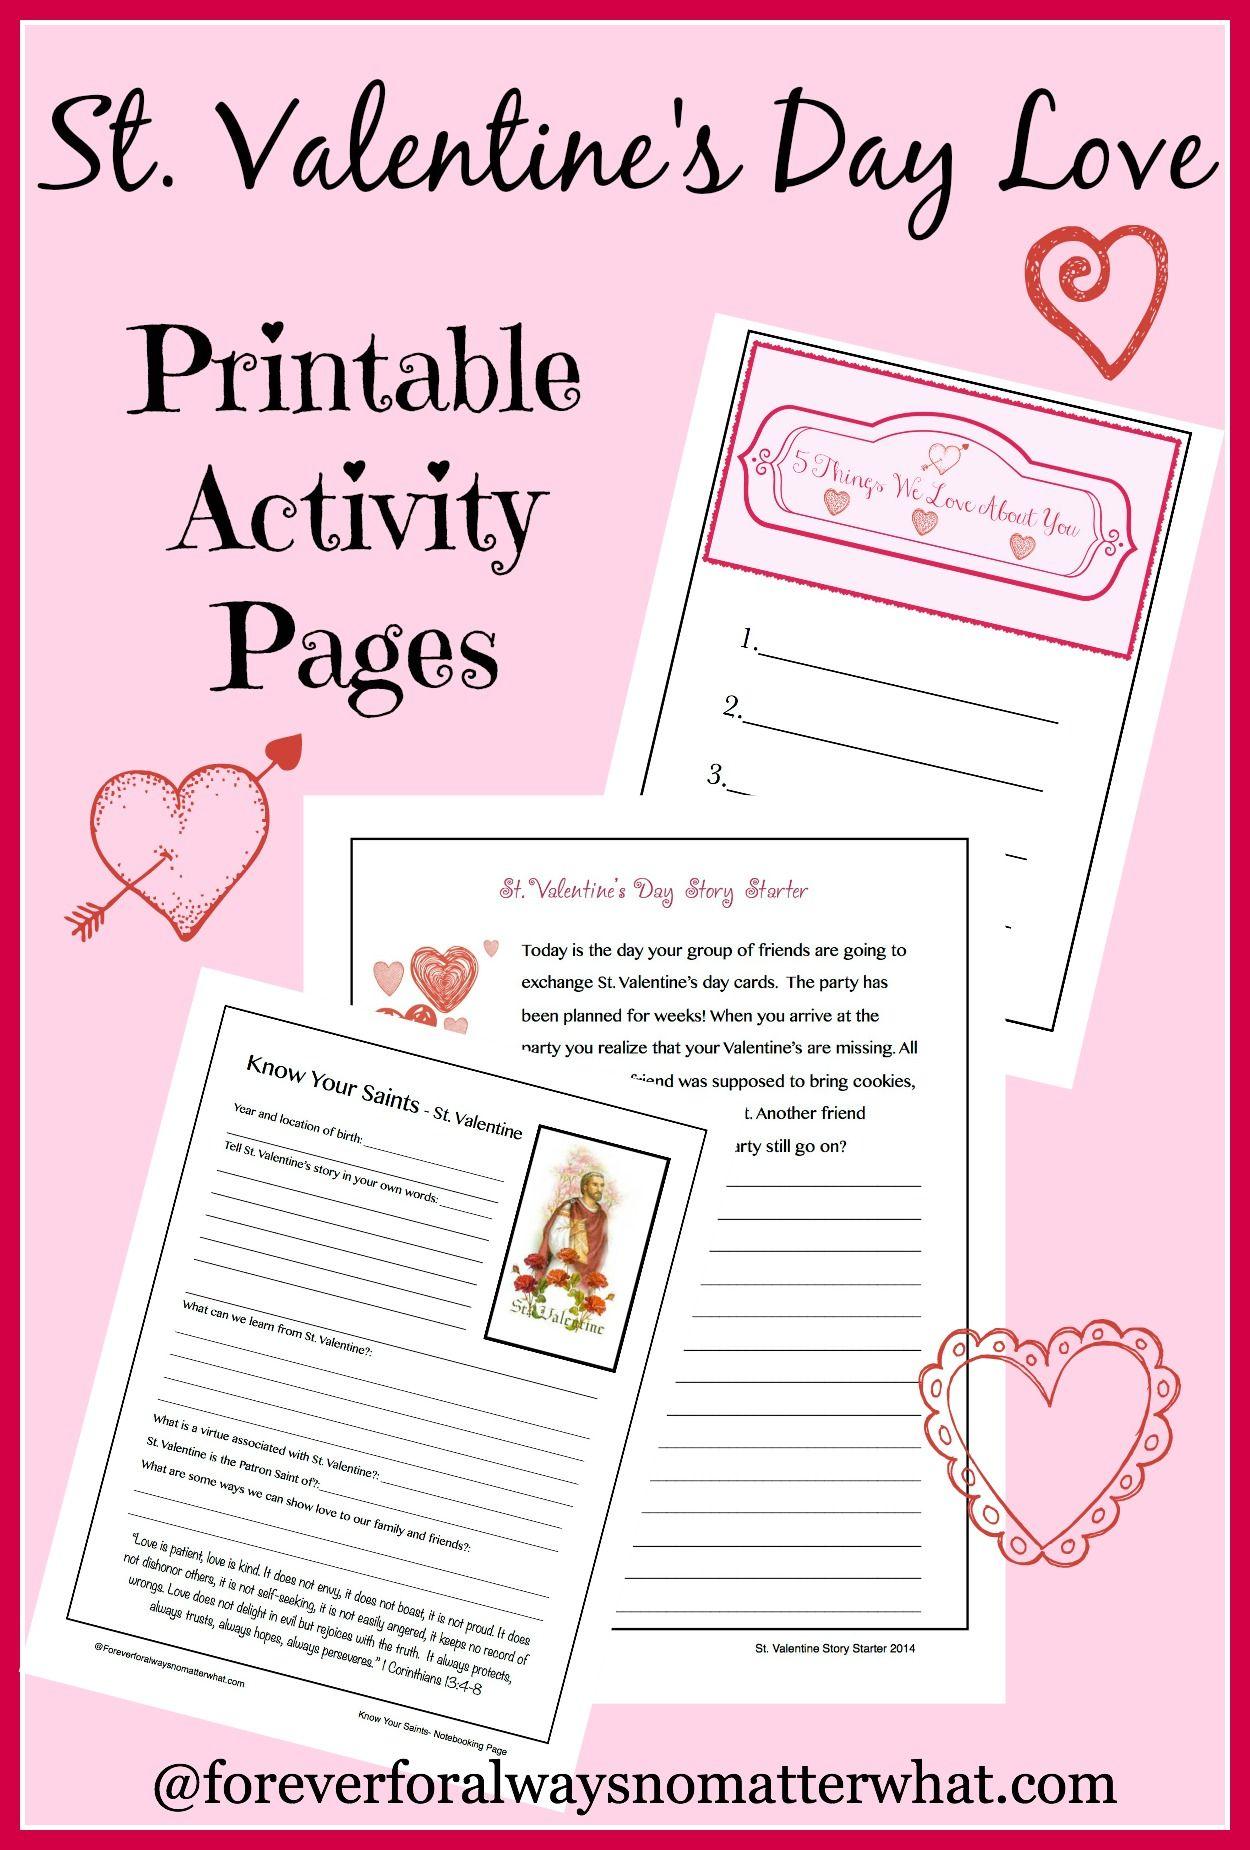 St. Valentine\'s Day Love - A Printable | Activities, Sunday school ...